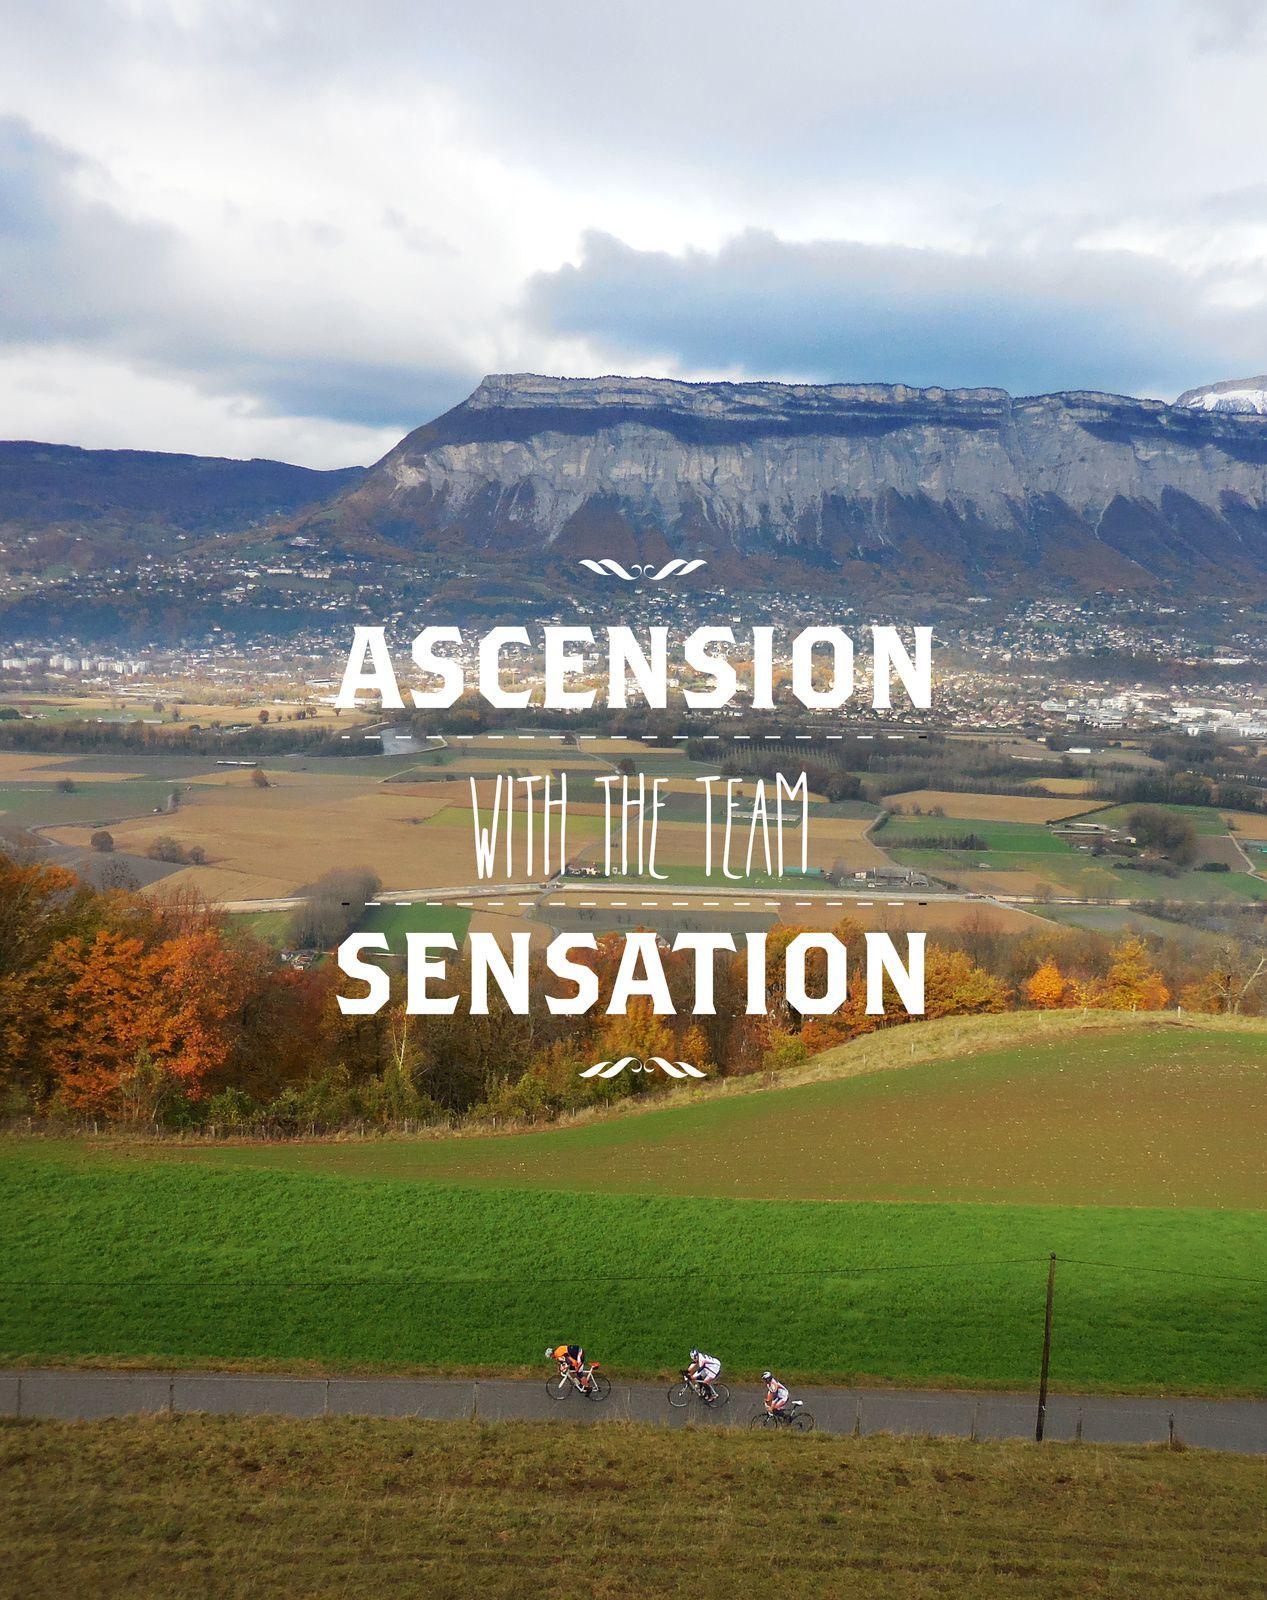 Ascension, sensation !